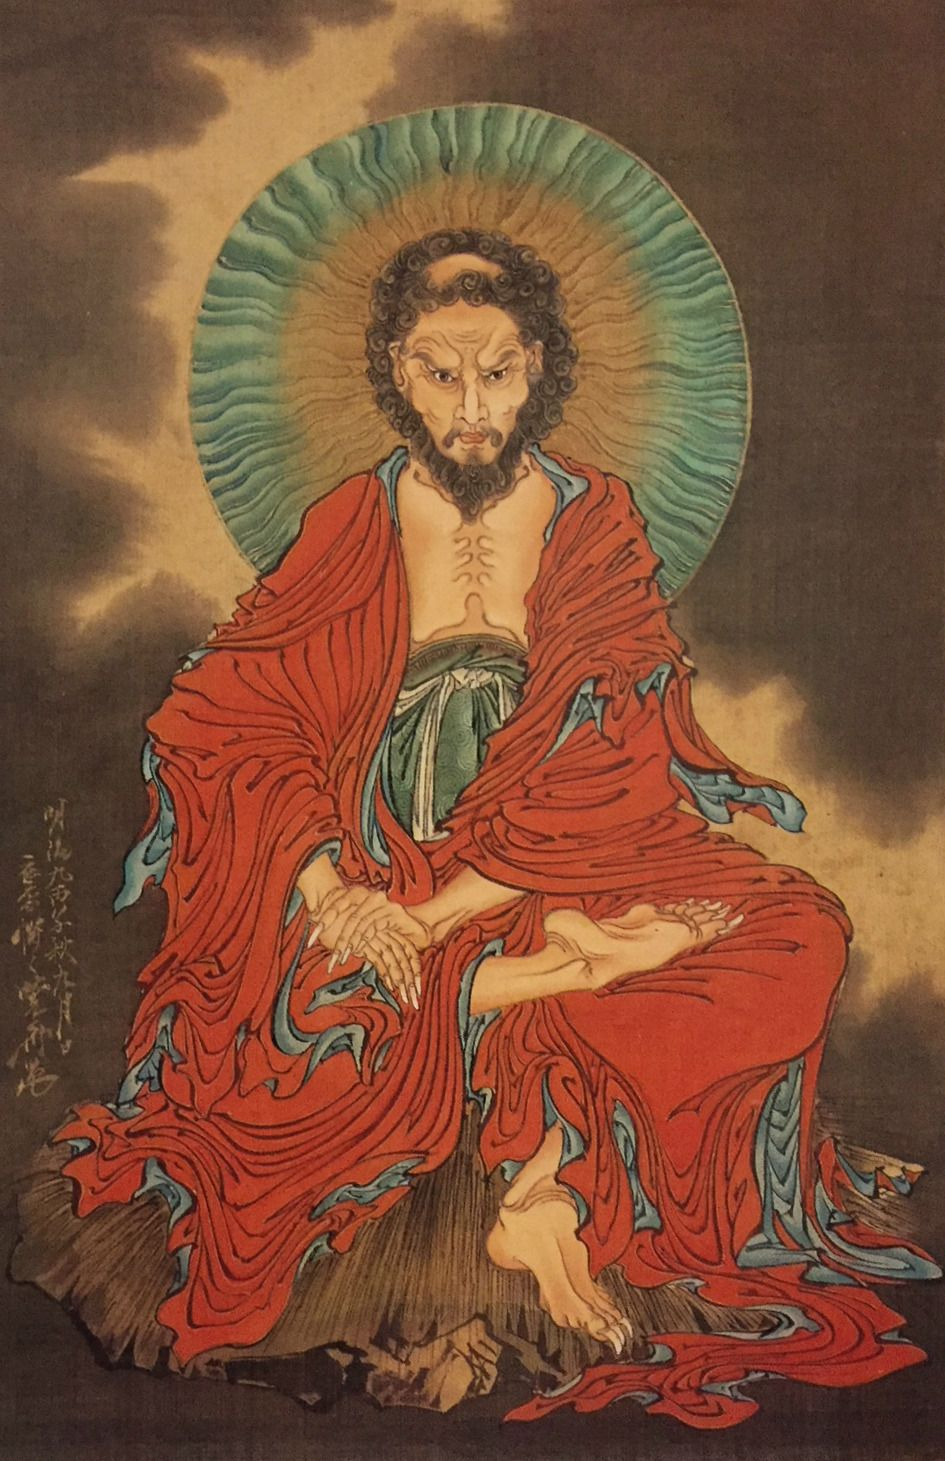 Kawanabe Kyosai Shakyamuni Undergoing Austerities 1876 When The Historical Buddha Renounced His Princely Life To Seek En Buddhism Art Buddha Art Buddhist Art